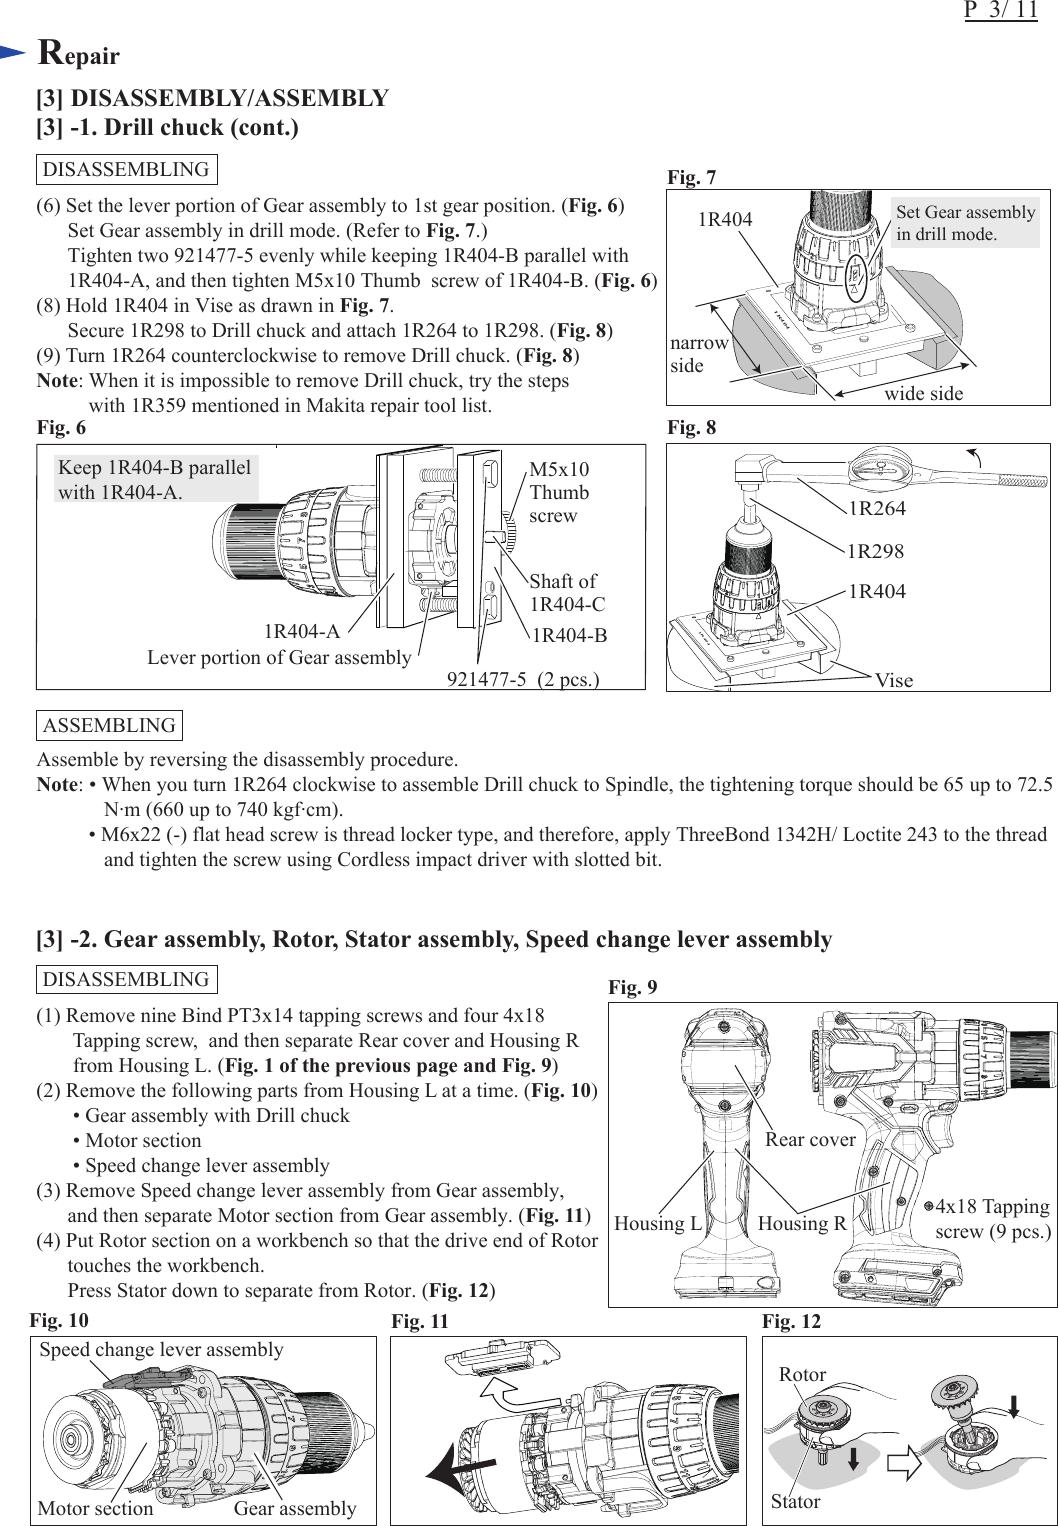 Makita DDF481 User Manual To The 52708a1f 2af7 45b3 a37d 928d0d1f5608